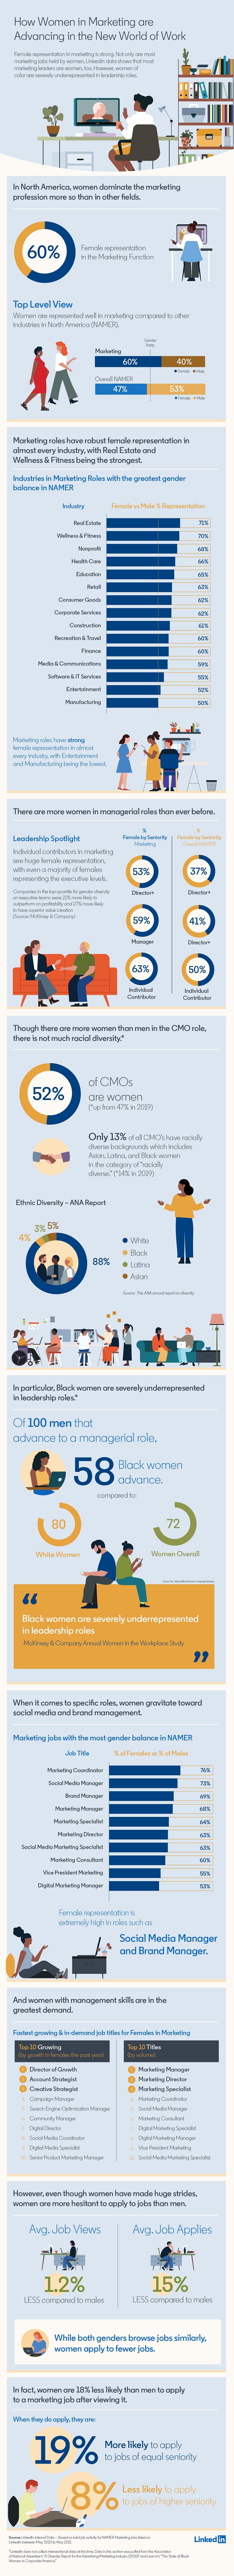 LinkedIn gender diversity report